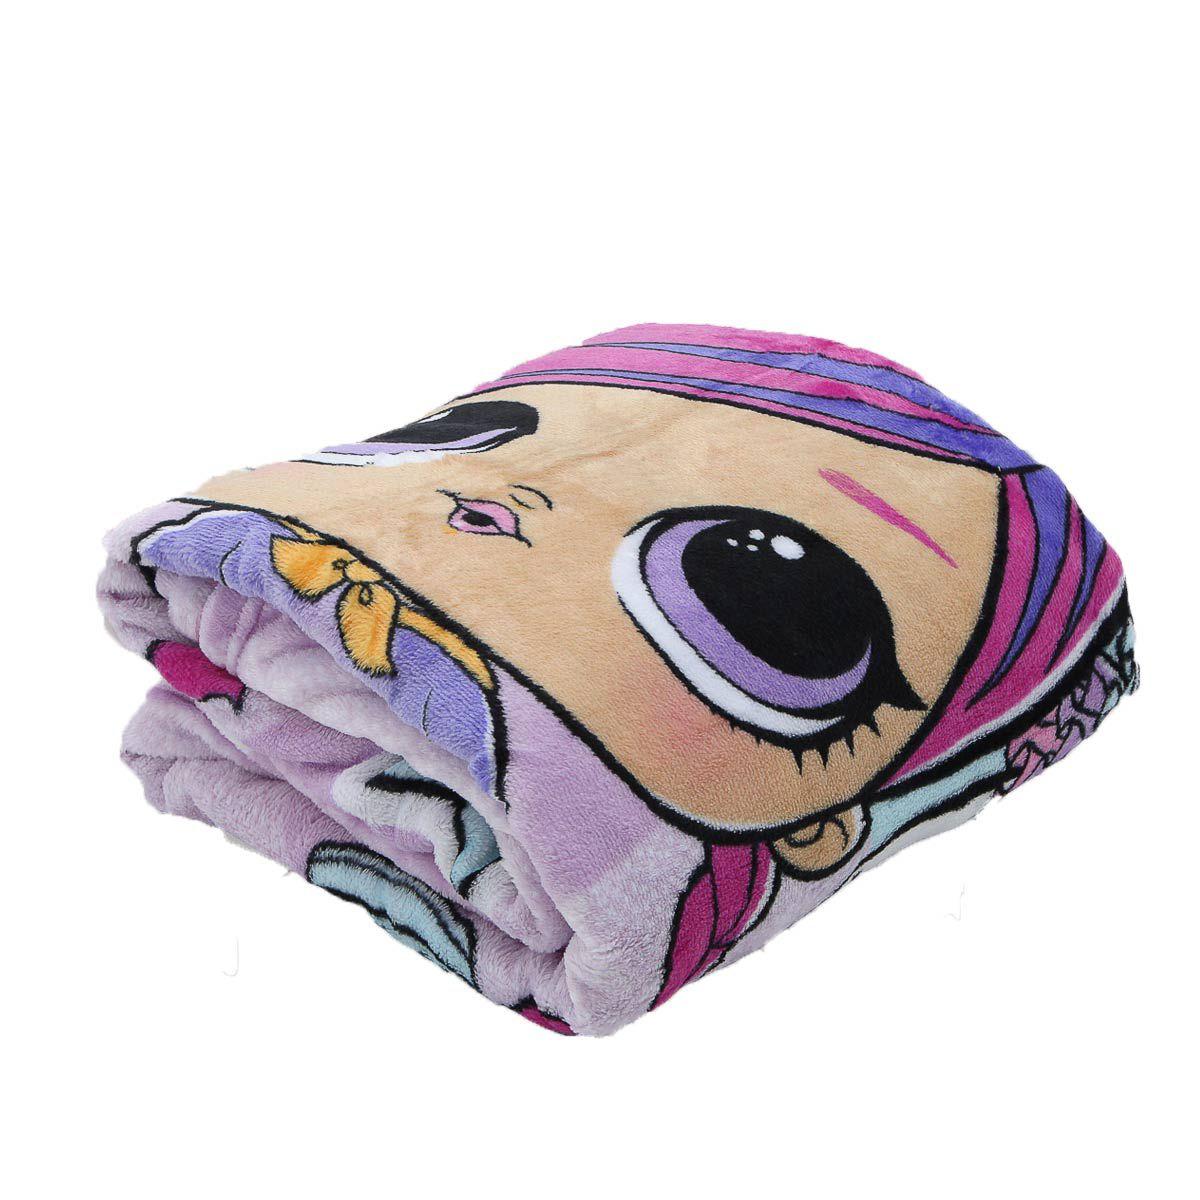 Cobertor Manta Lilás Fleece Lol Surprise Infantil Lepper